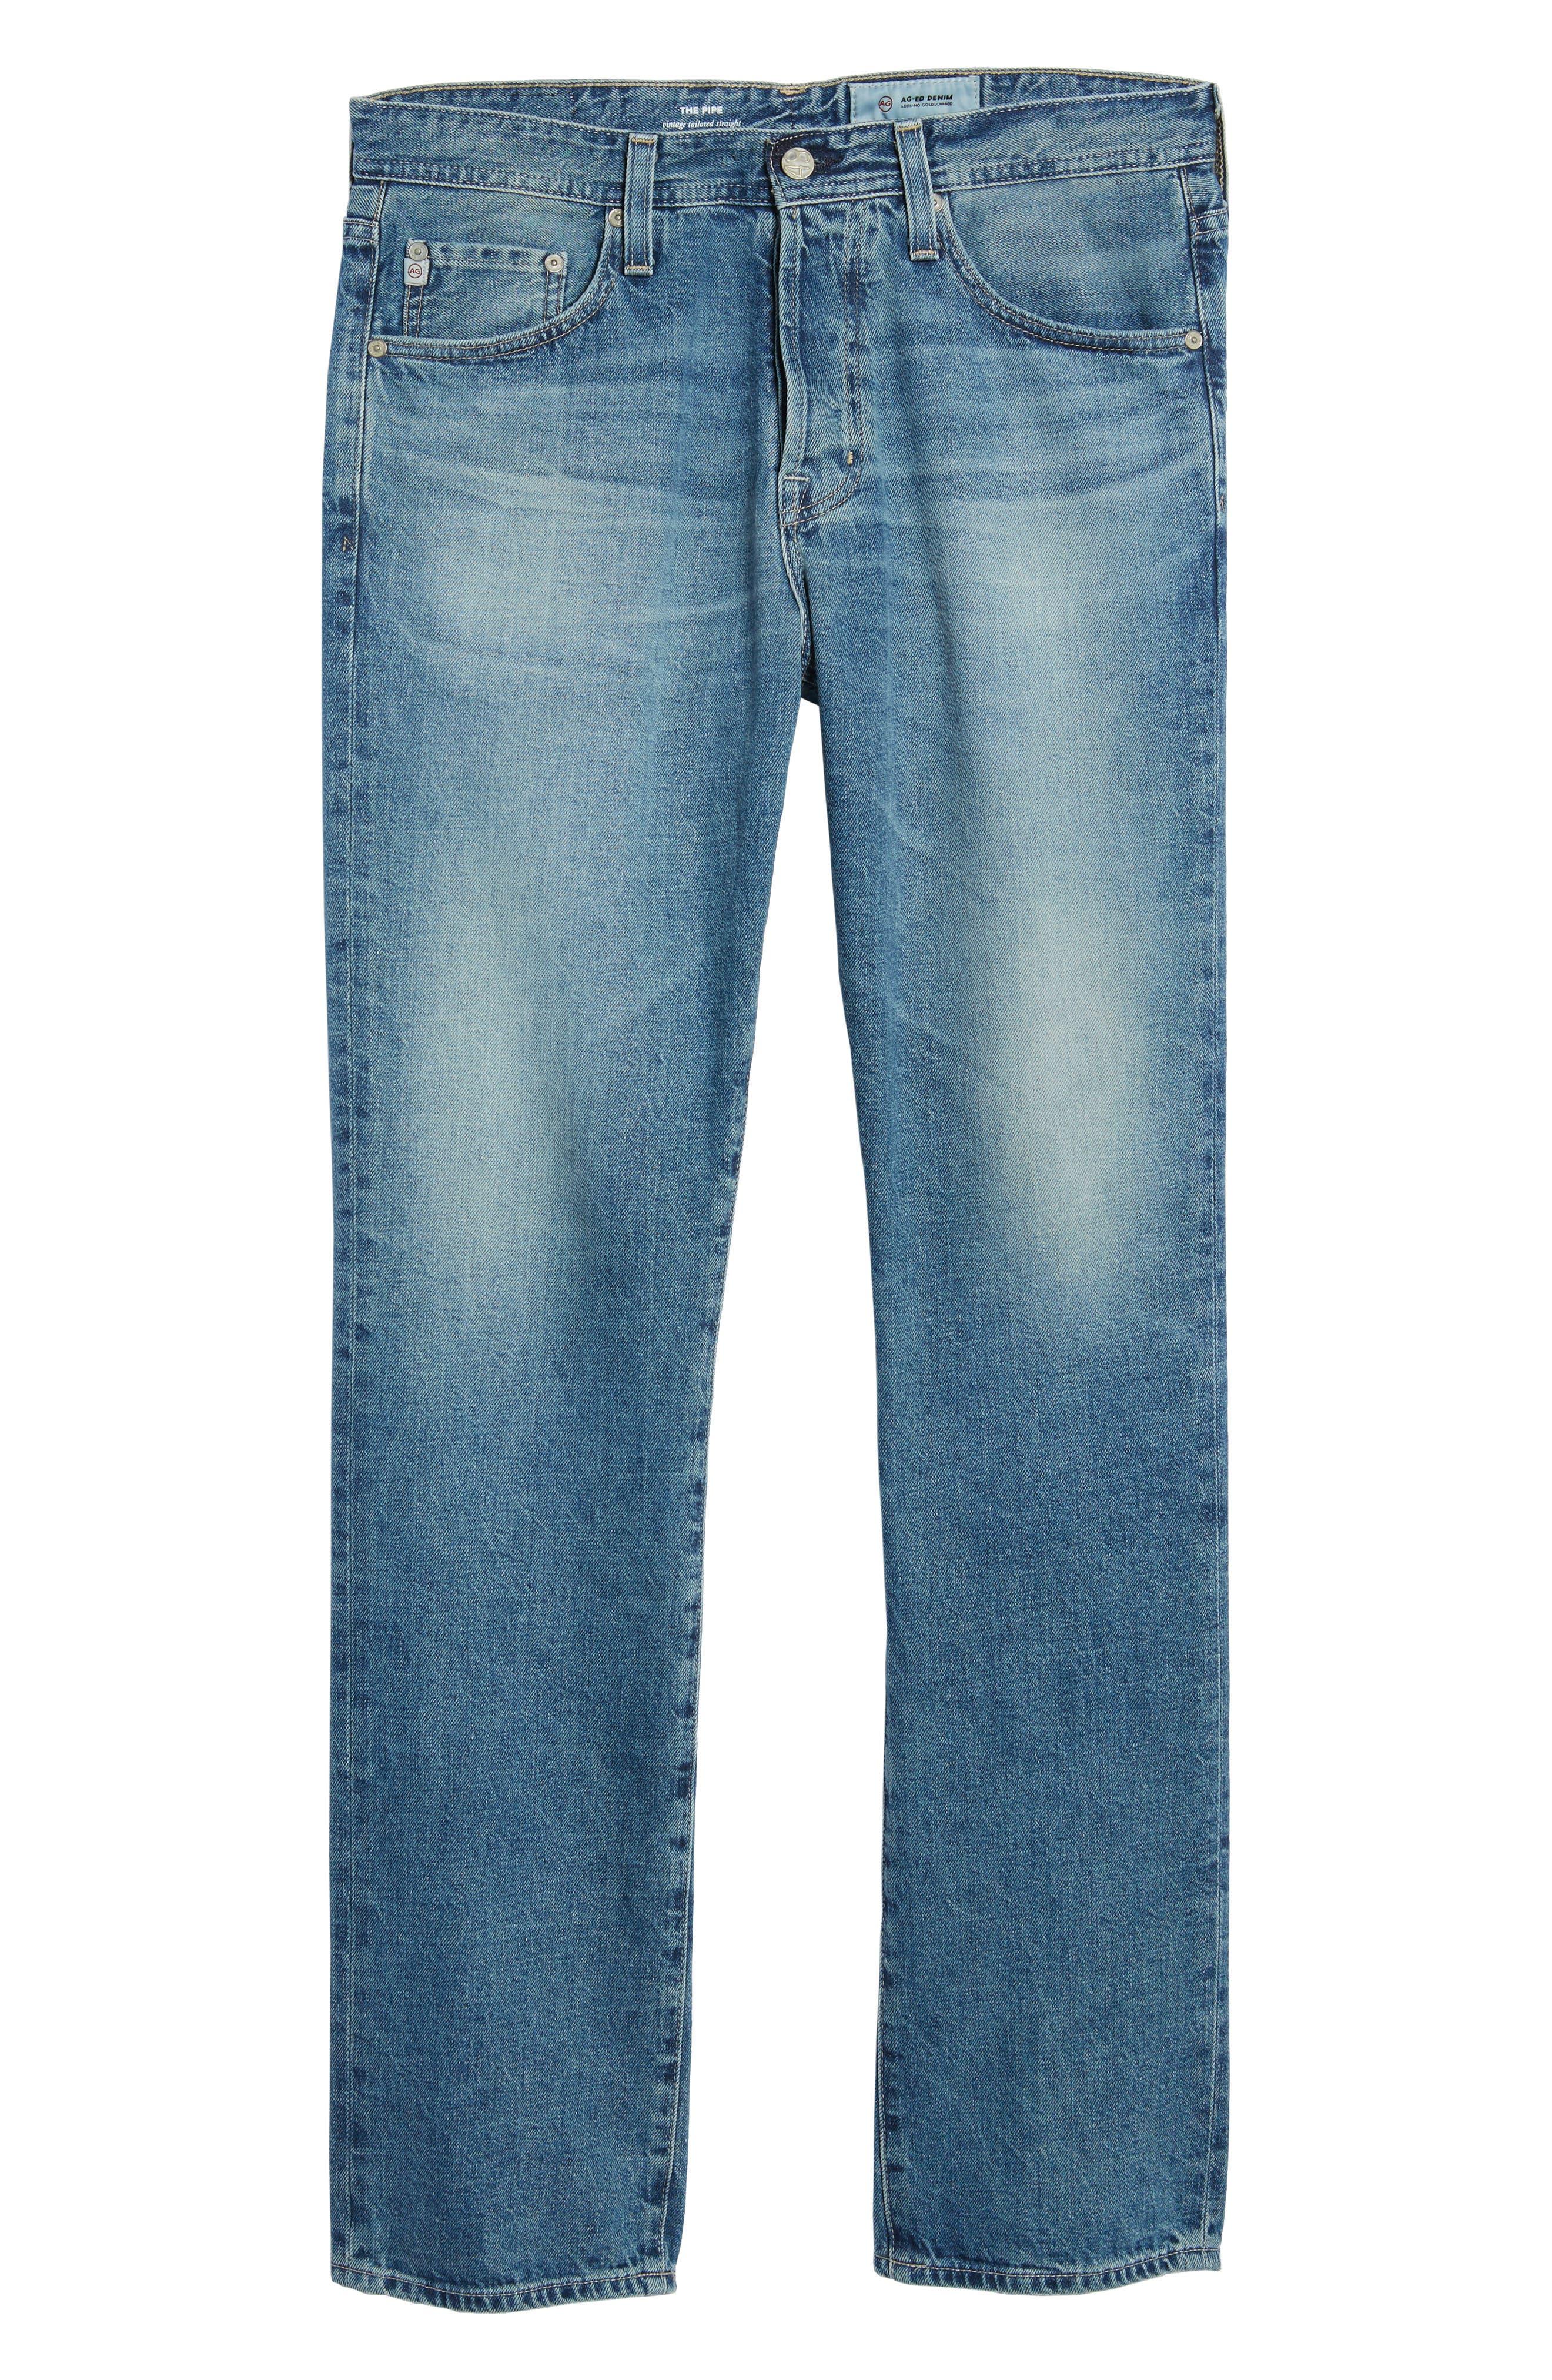 Pipe Slim Straight Leg Jeans,                             Alternate thumbnail 6, color,                             464